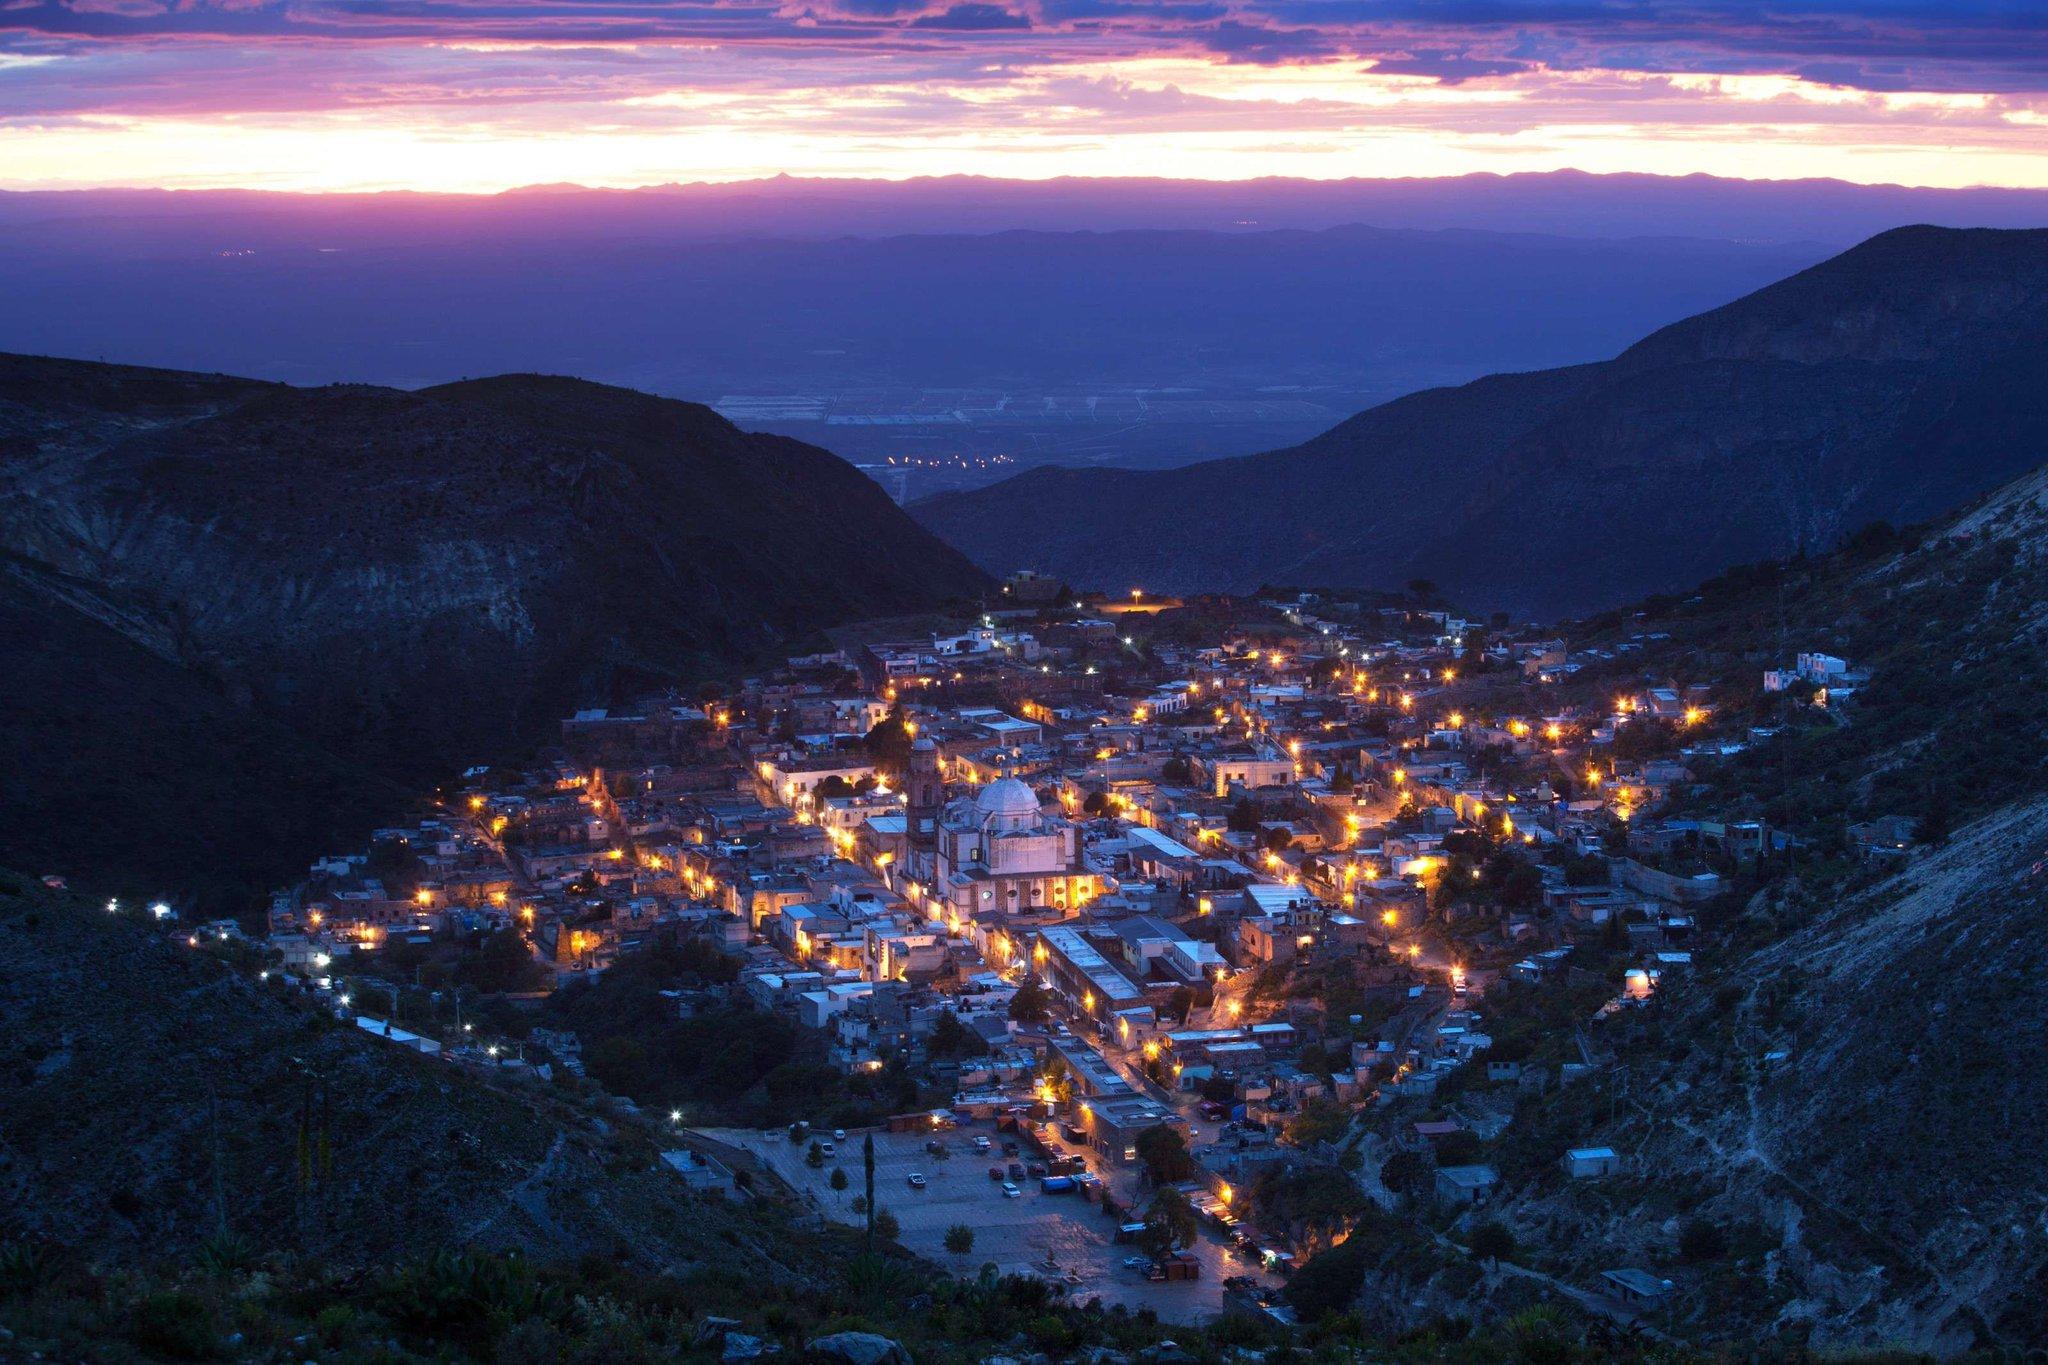 Real de Catorce - Panoramica Noche